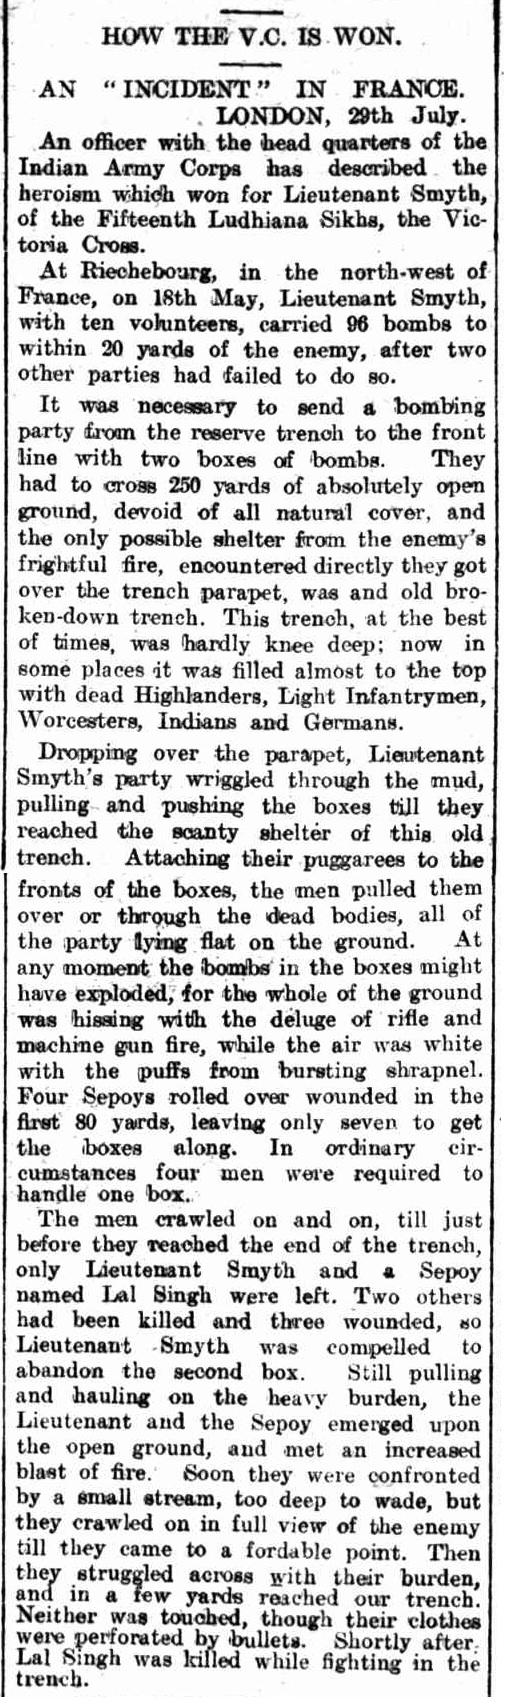 Page 37, Leader Newspaper (Melbourne), Saturday 31 July 1915